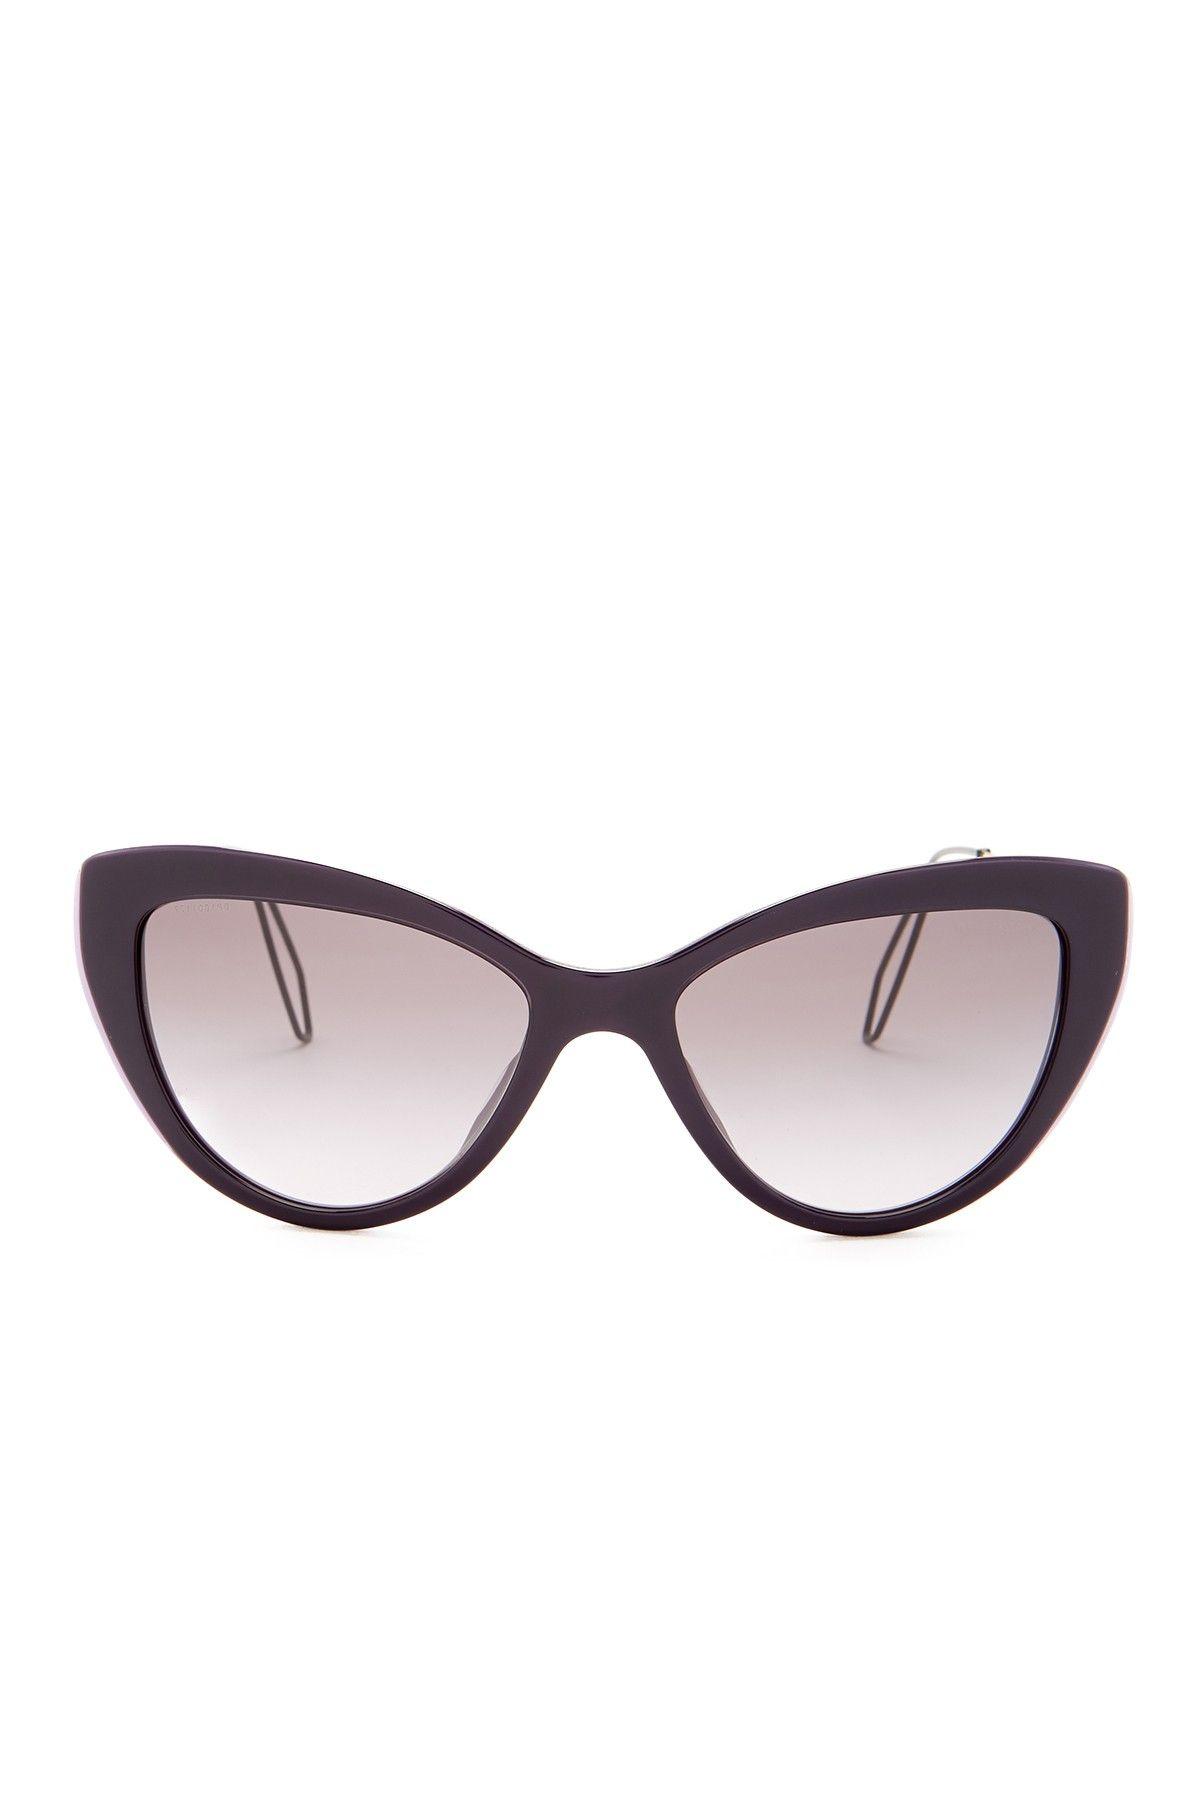 8080497f8b7a Women s Cat Eye Acetate Frame Sunglasses by MIU MIU on  nordstrom rack